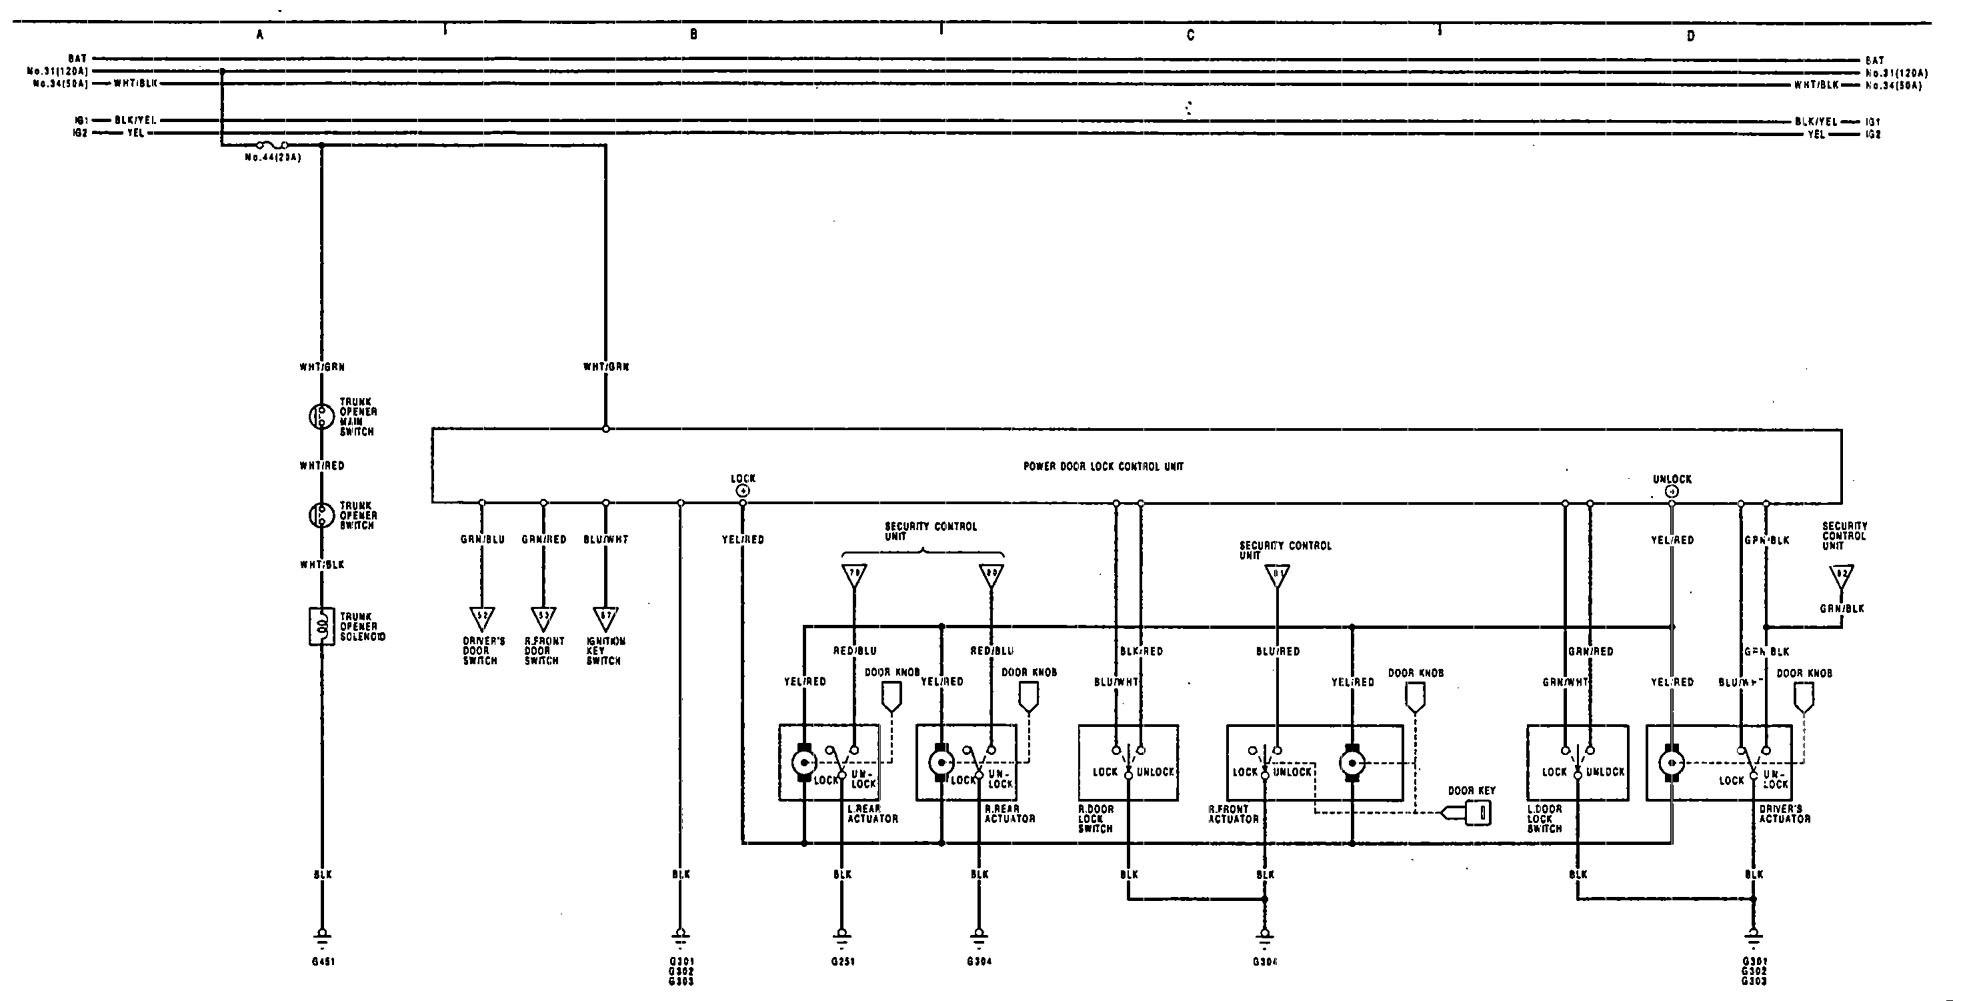 [DIAGRAM_3ER]  Acura Legend (1991 - 1993) - wiring diagram - power locks - CARKNOWLEDGE | 1993 Acura Legend Wiring Diagram |  | Carknowledge.info